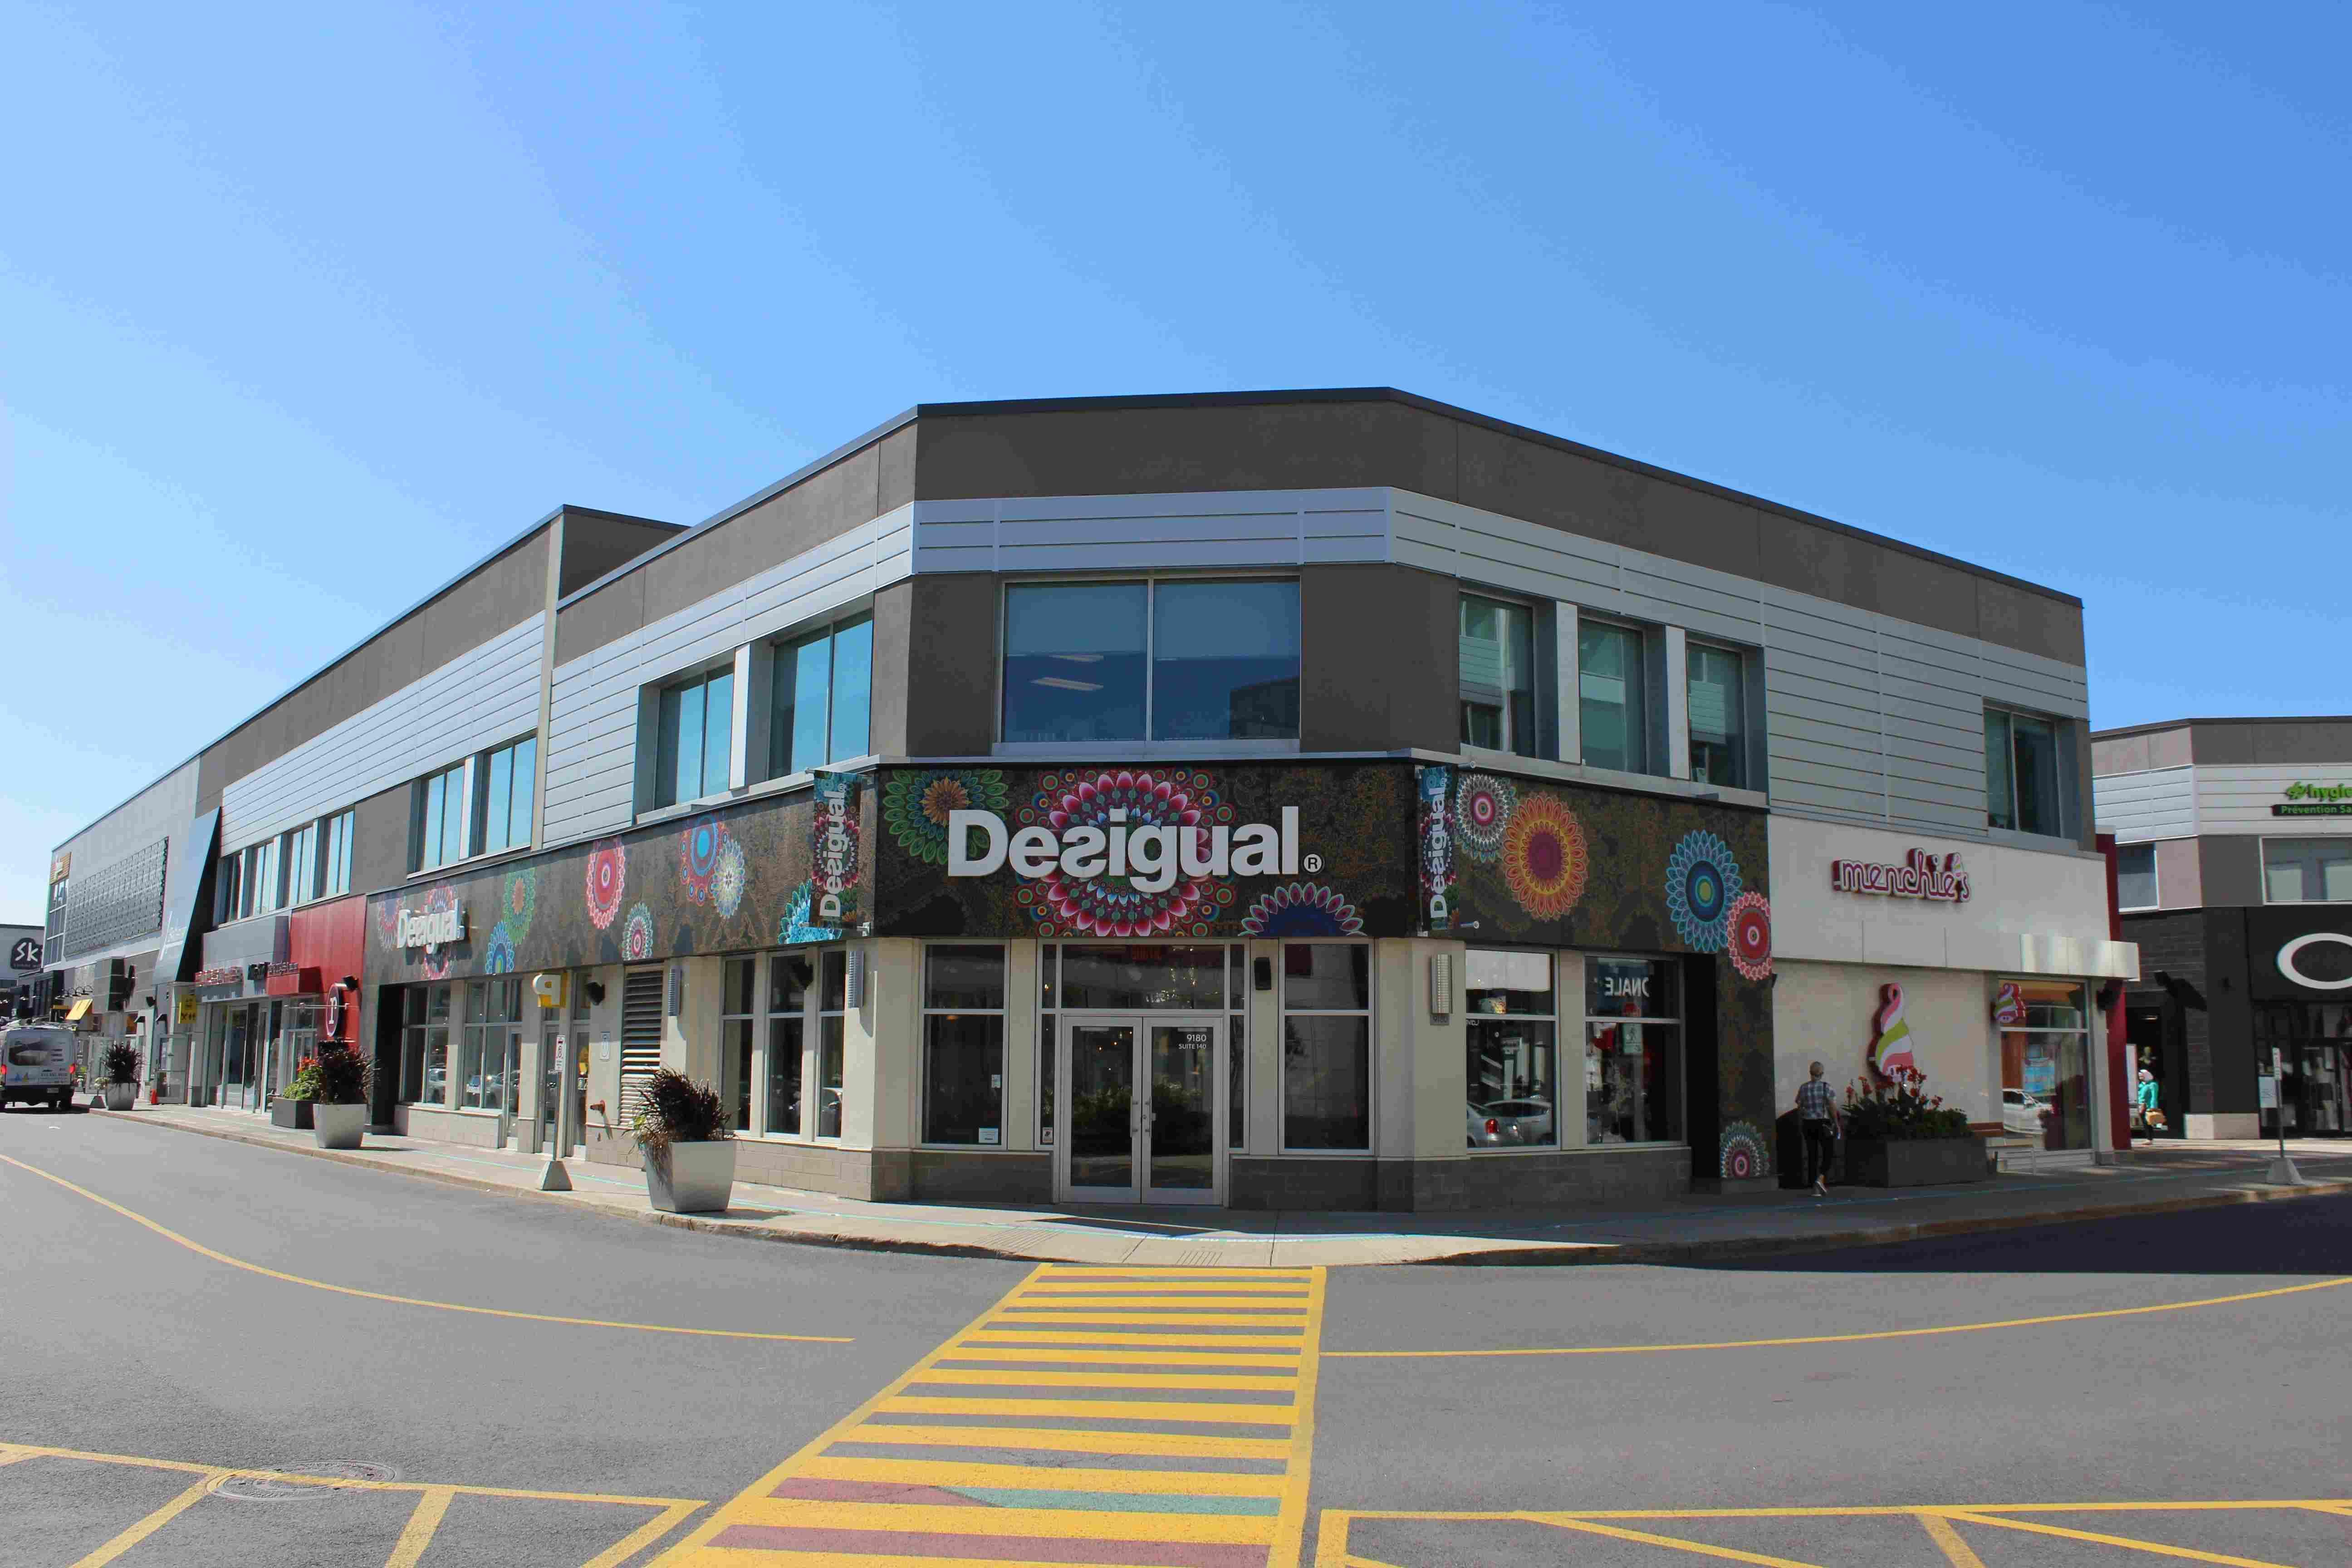 9180 Leduc Boulevard, Brossard, Québec